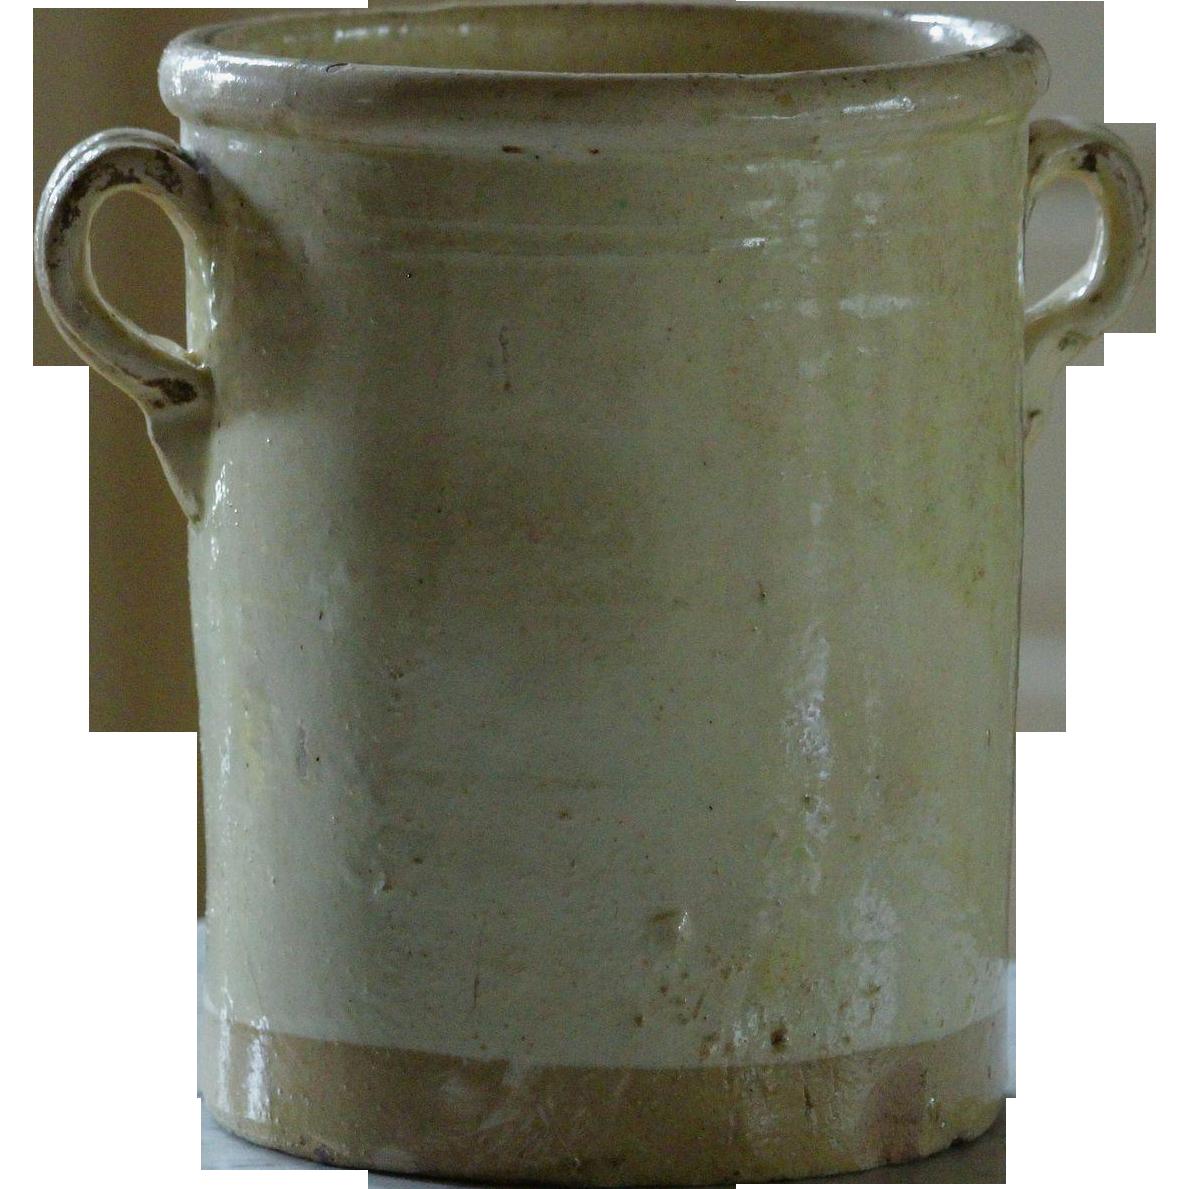 Antique Italian Earthenware Glazed Confit Pot - 19th Century Terracotta Preserve Jar